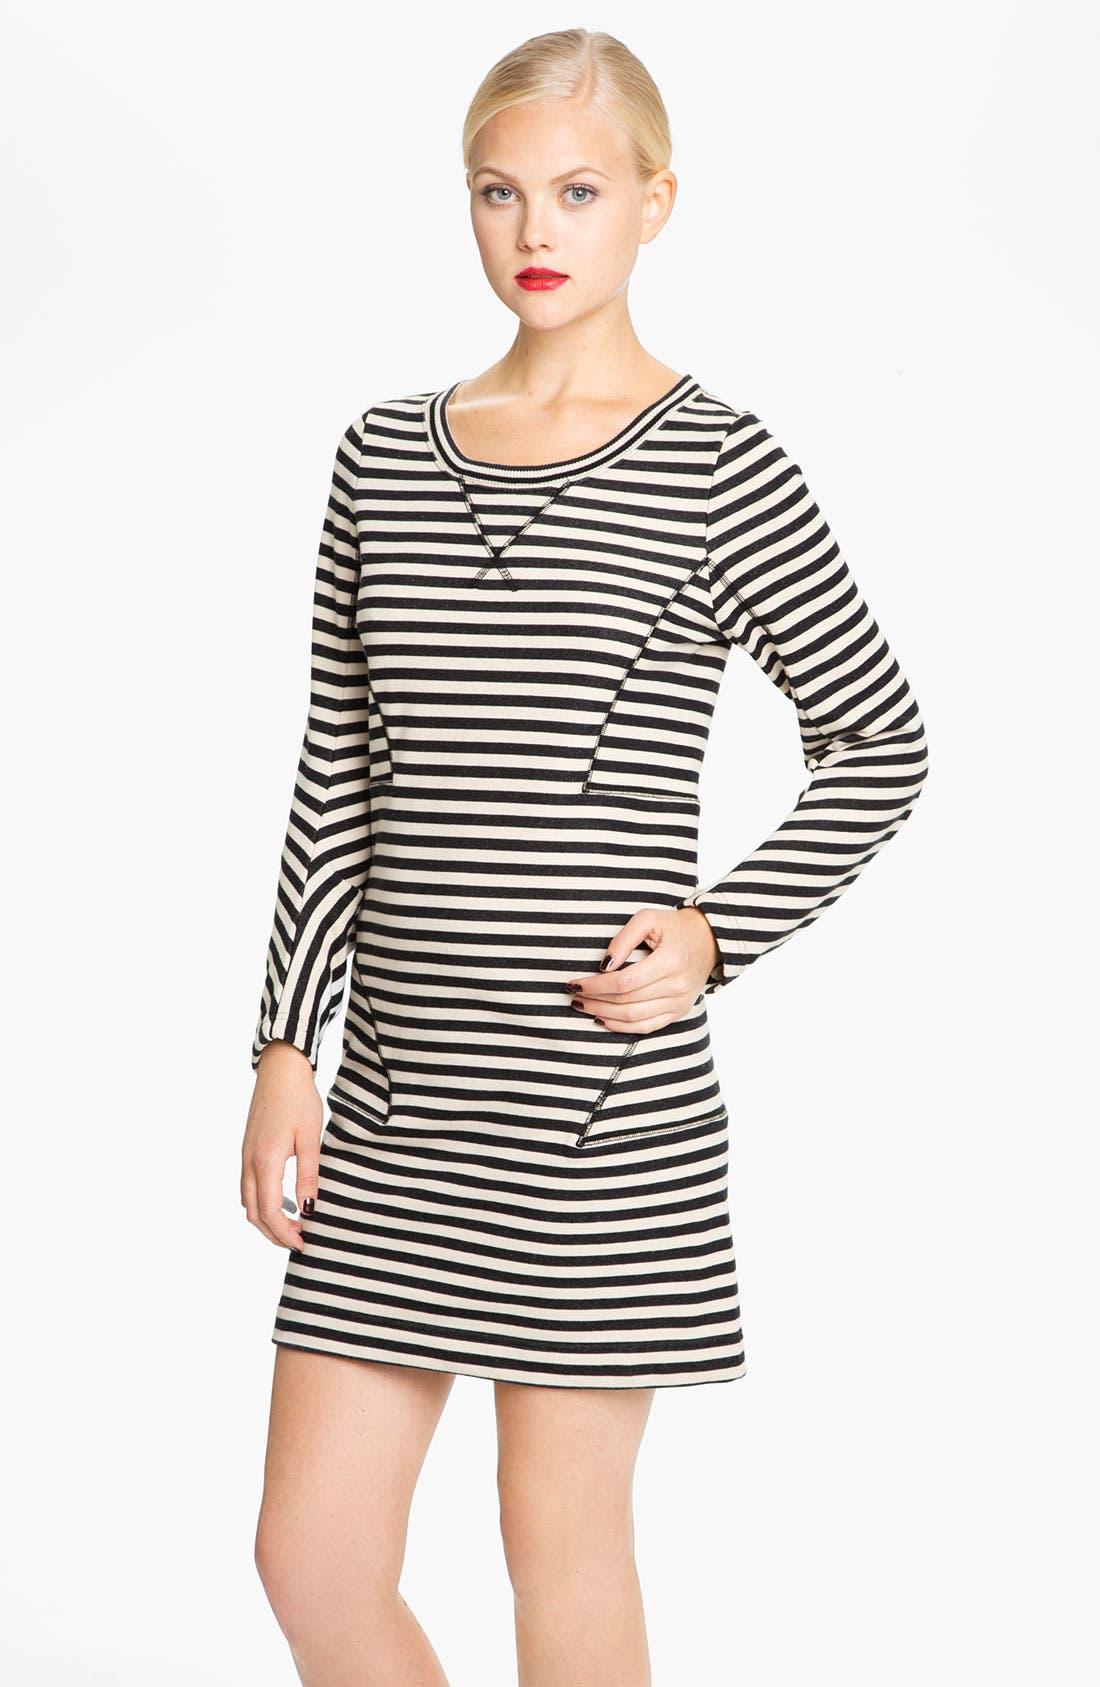 Alternate Image 1 Selected - MARC BY MARC JACOBS 'Ben' Stripe Sweatshirt Dress